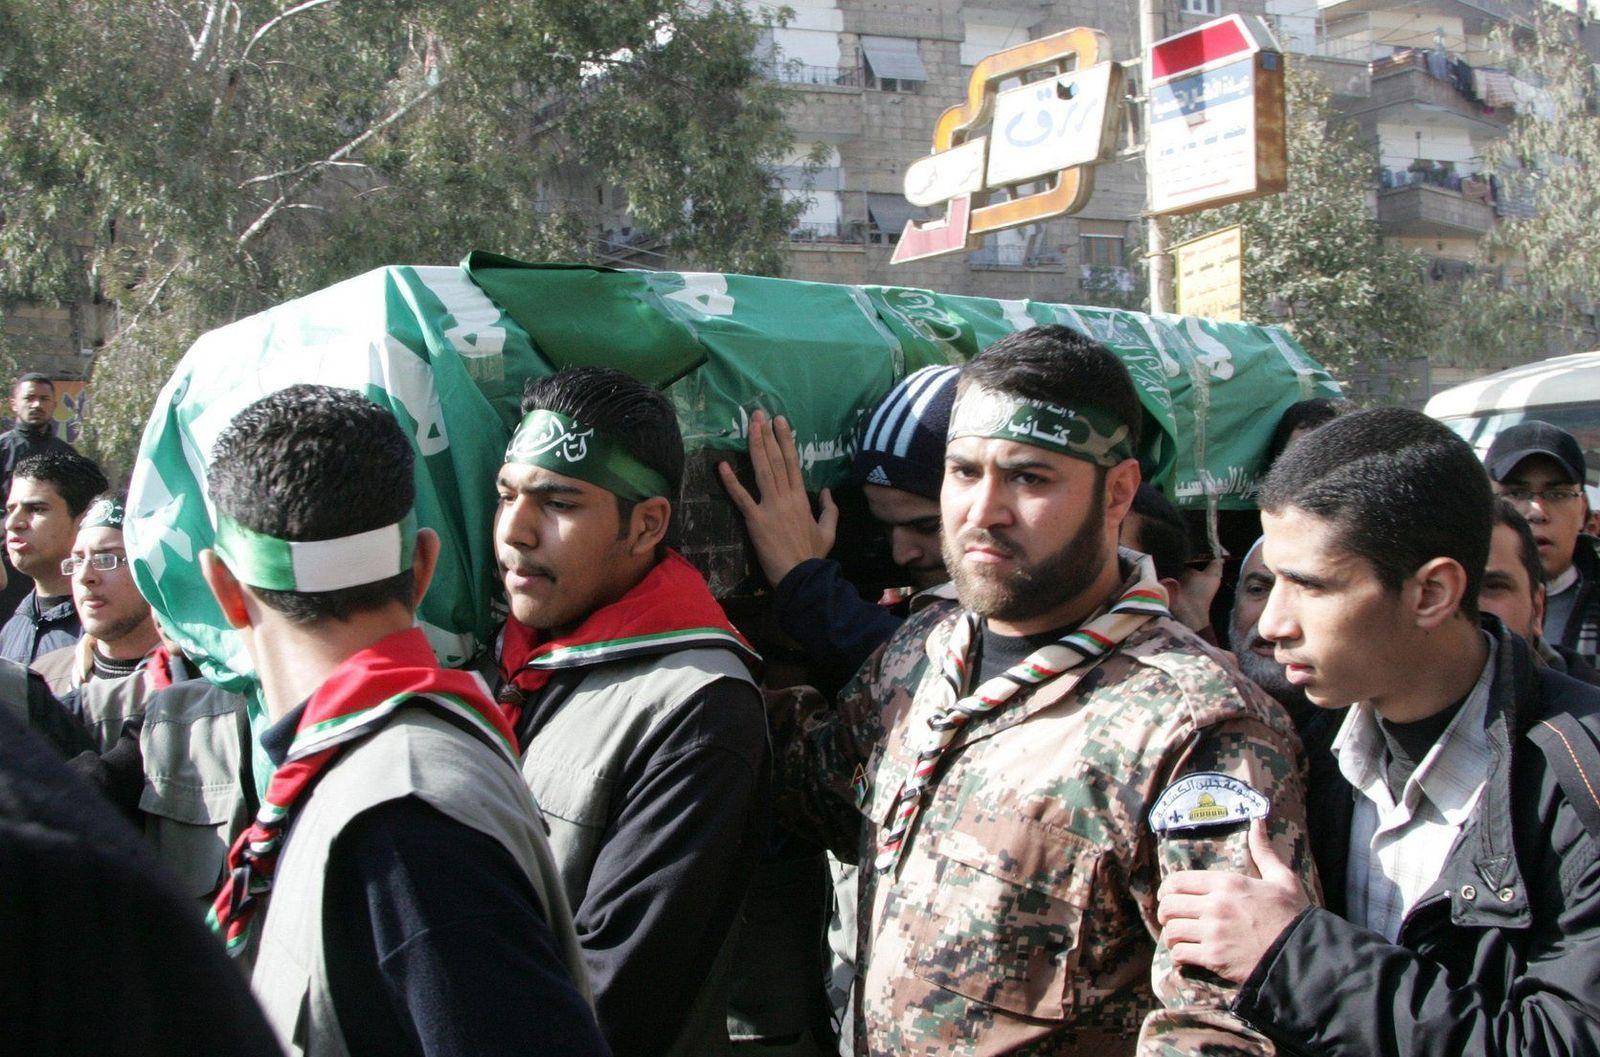 Mahmud Abdel Rauf al-Mabhuh, Beerdigung